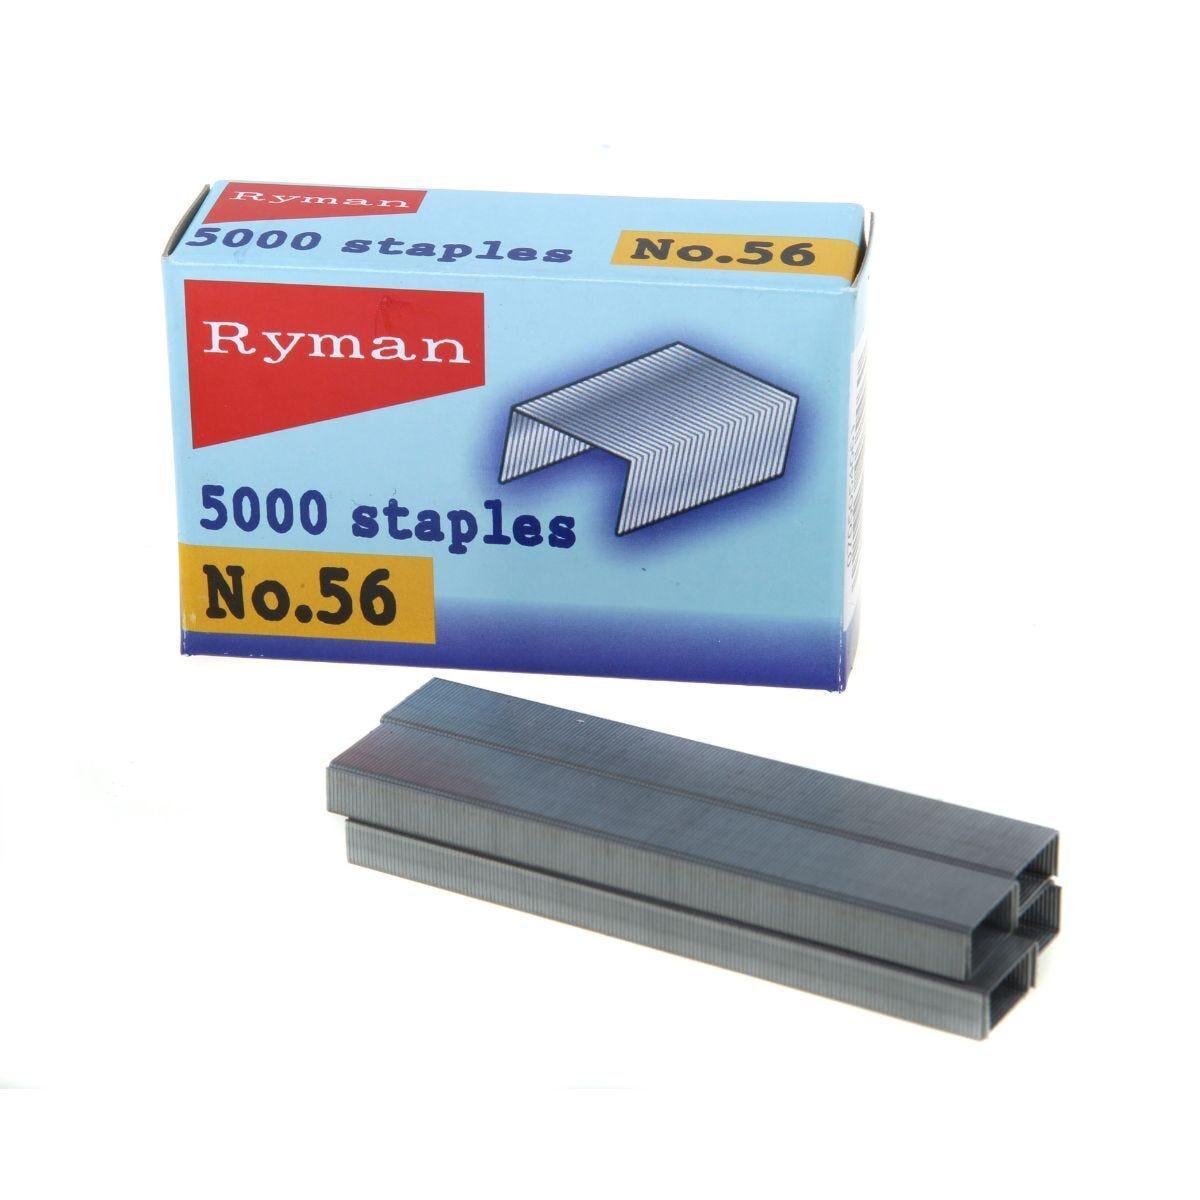 Ryman Staples No56 26/6 12 Packs of 5000